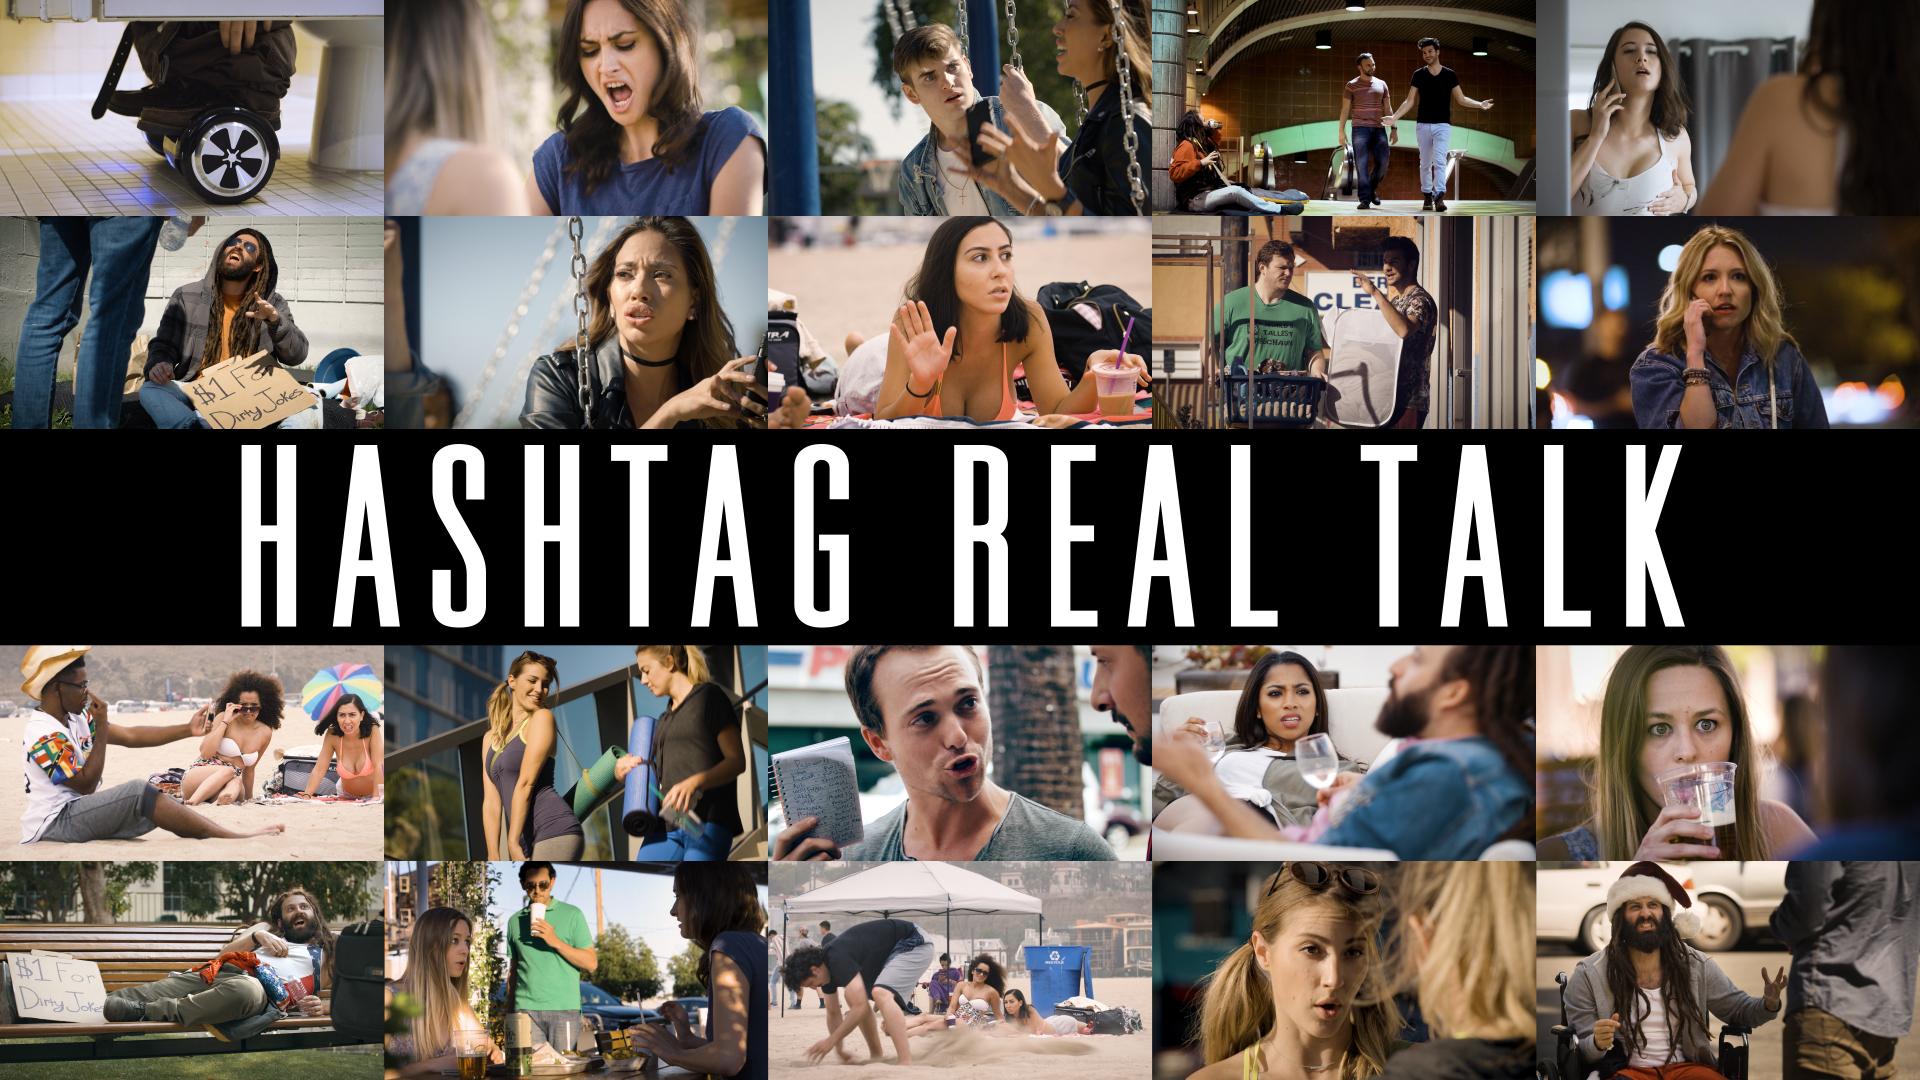 Hashtag Real Talk